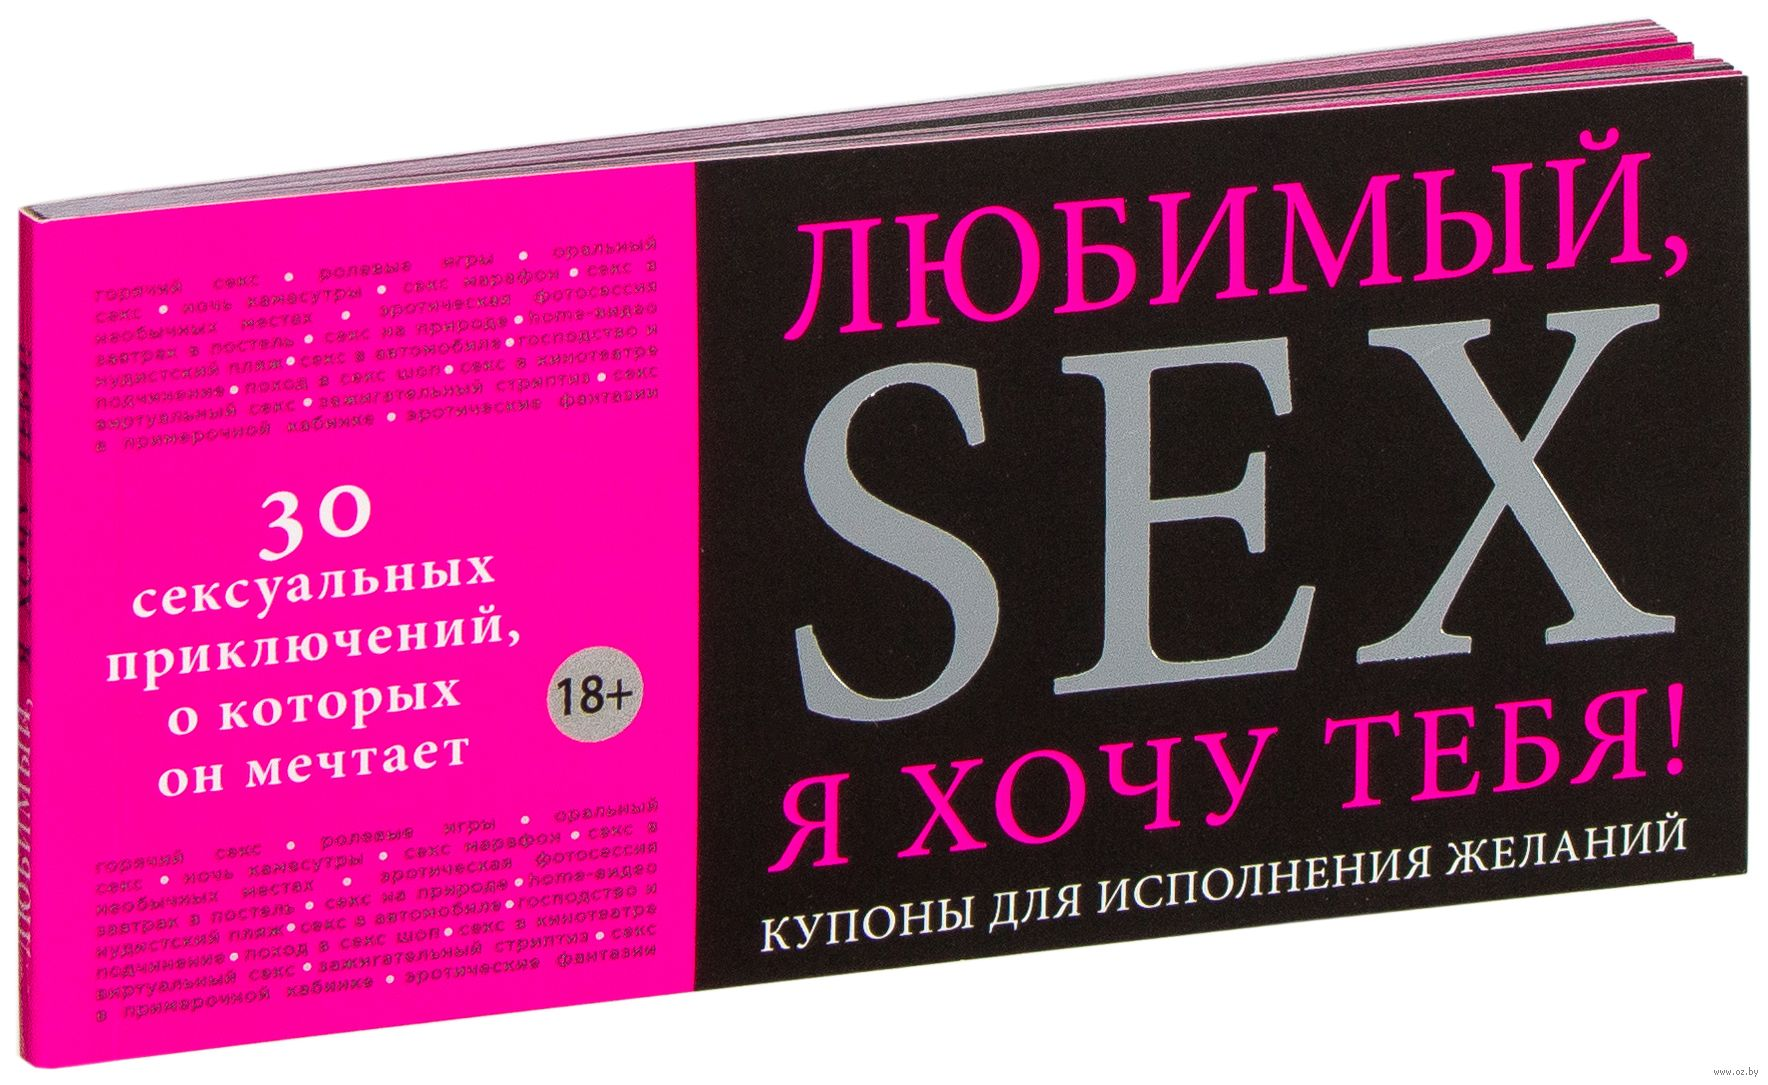 Сертификат на исполнение желания секс